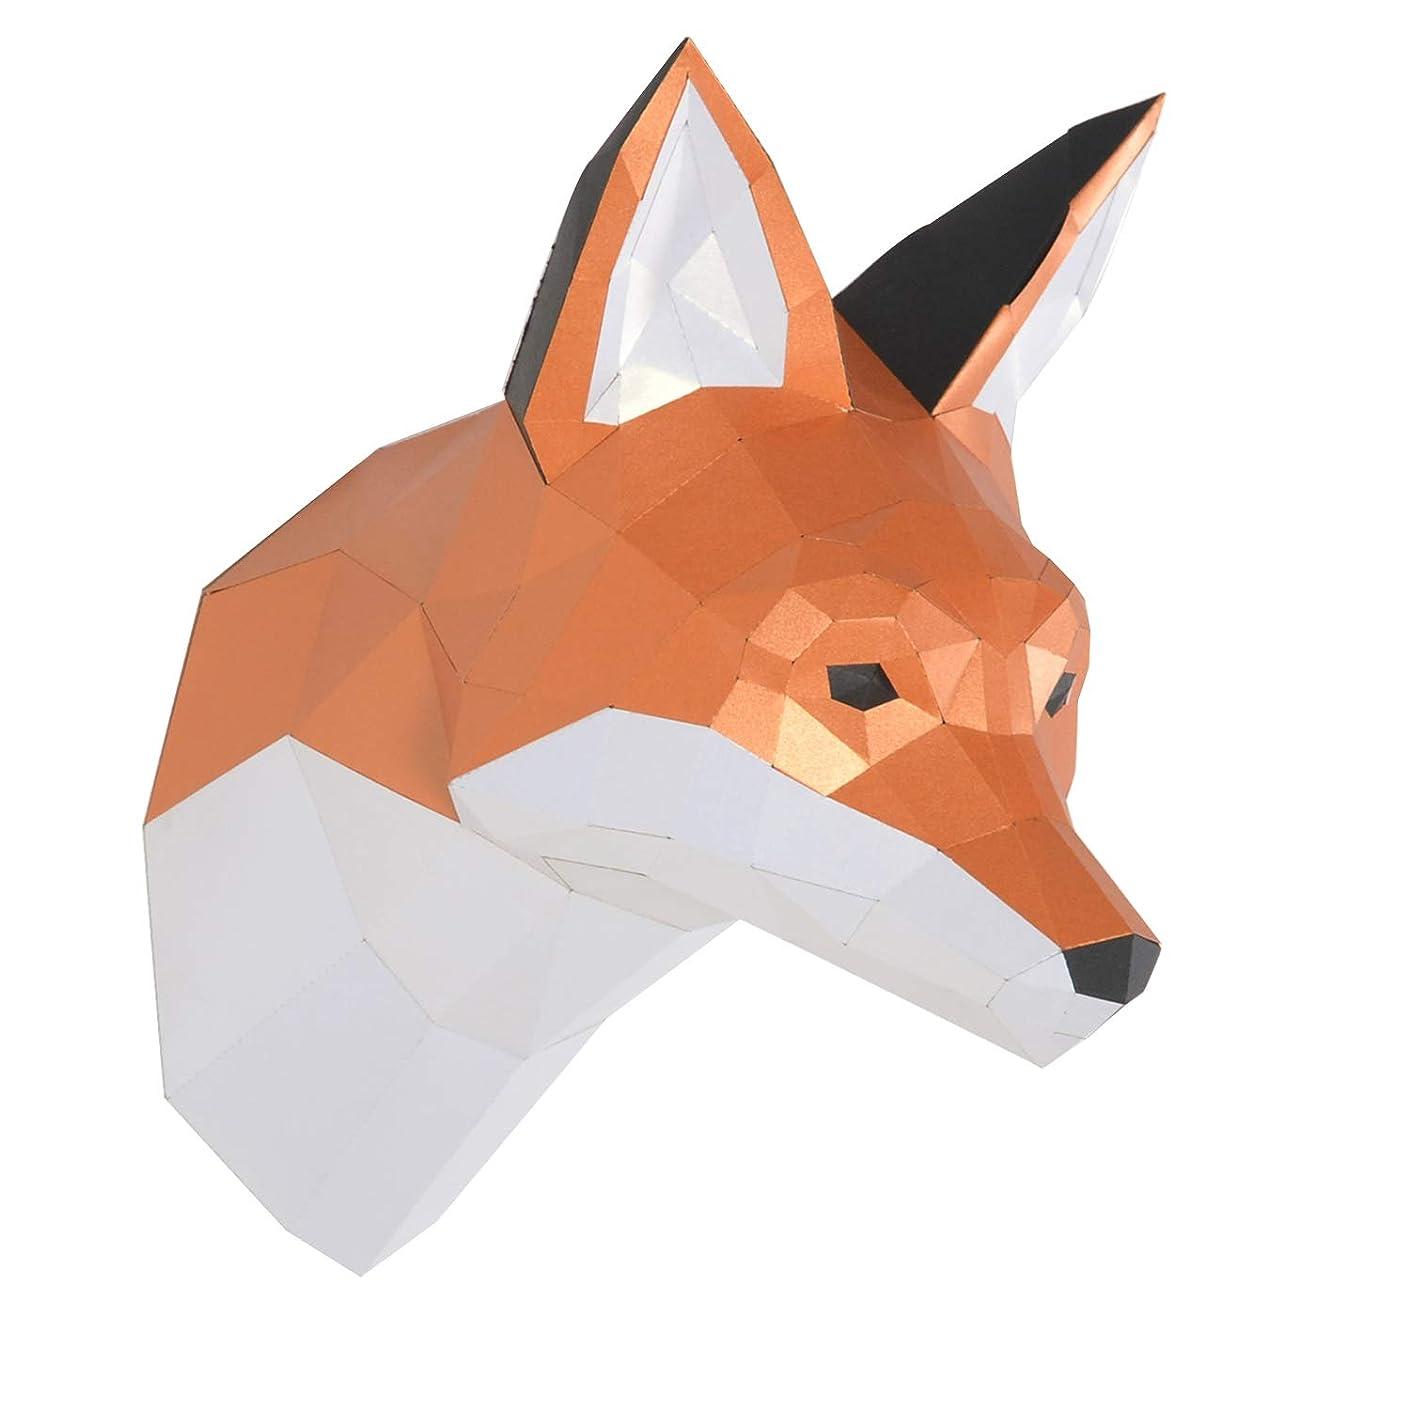 ENDARK Fox Paper Trophy, Origami Animal Kit, DIY Papercraft 3D Animal Head Wall Mounted